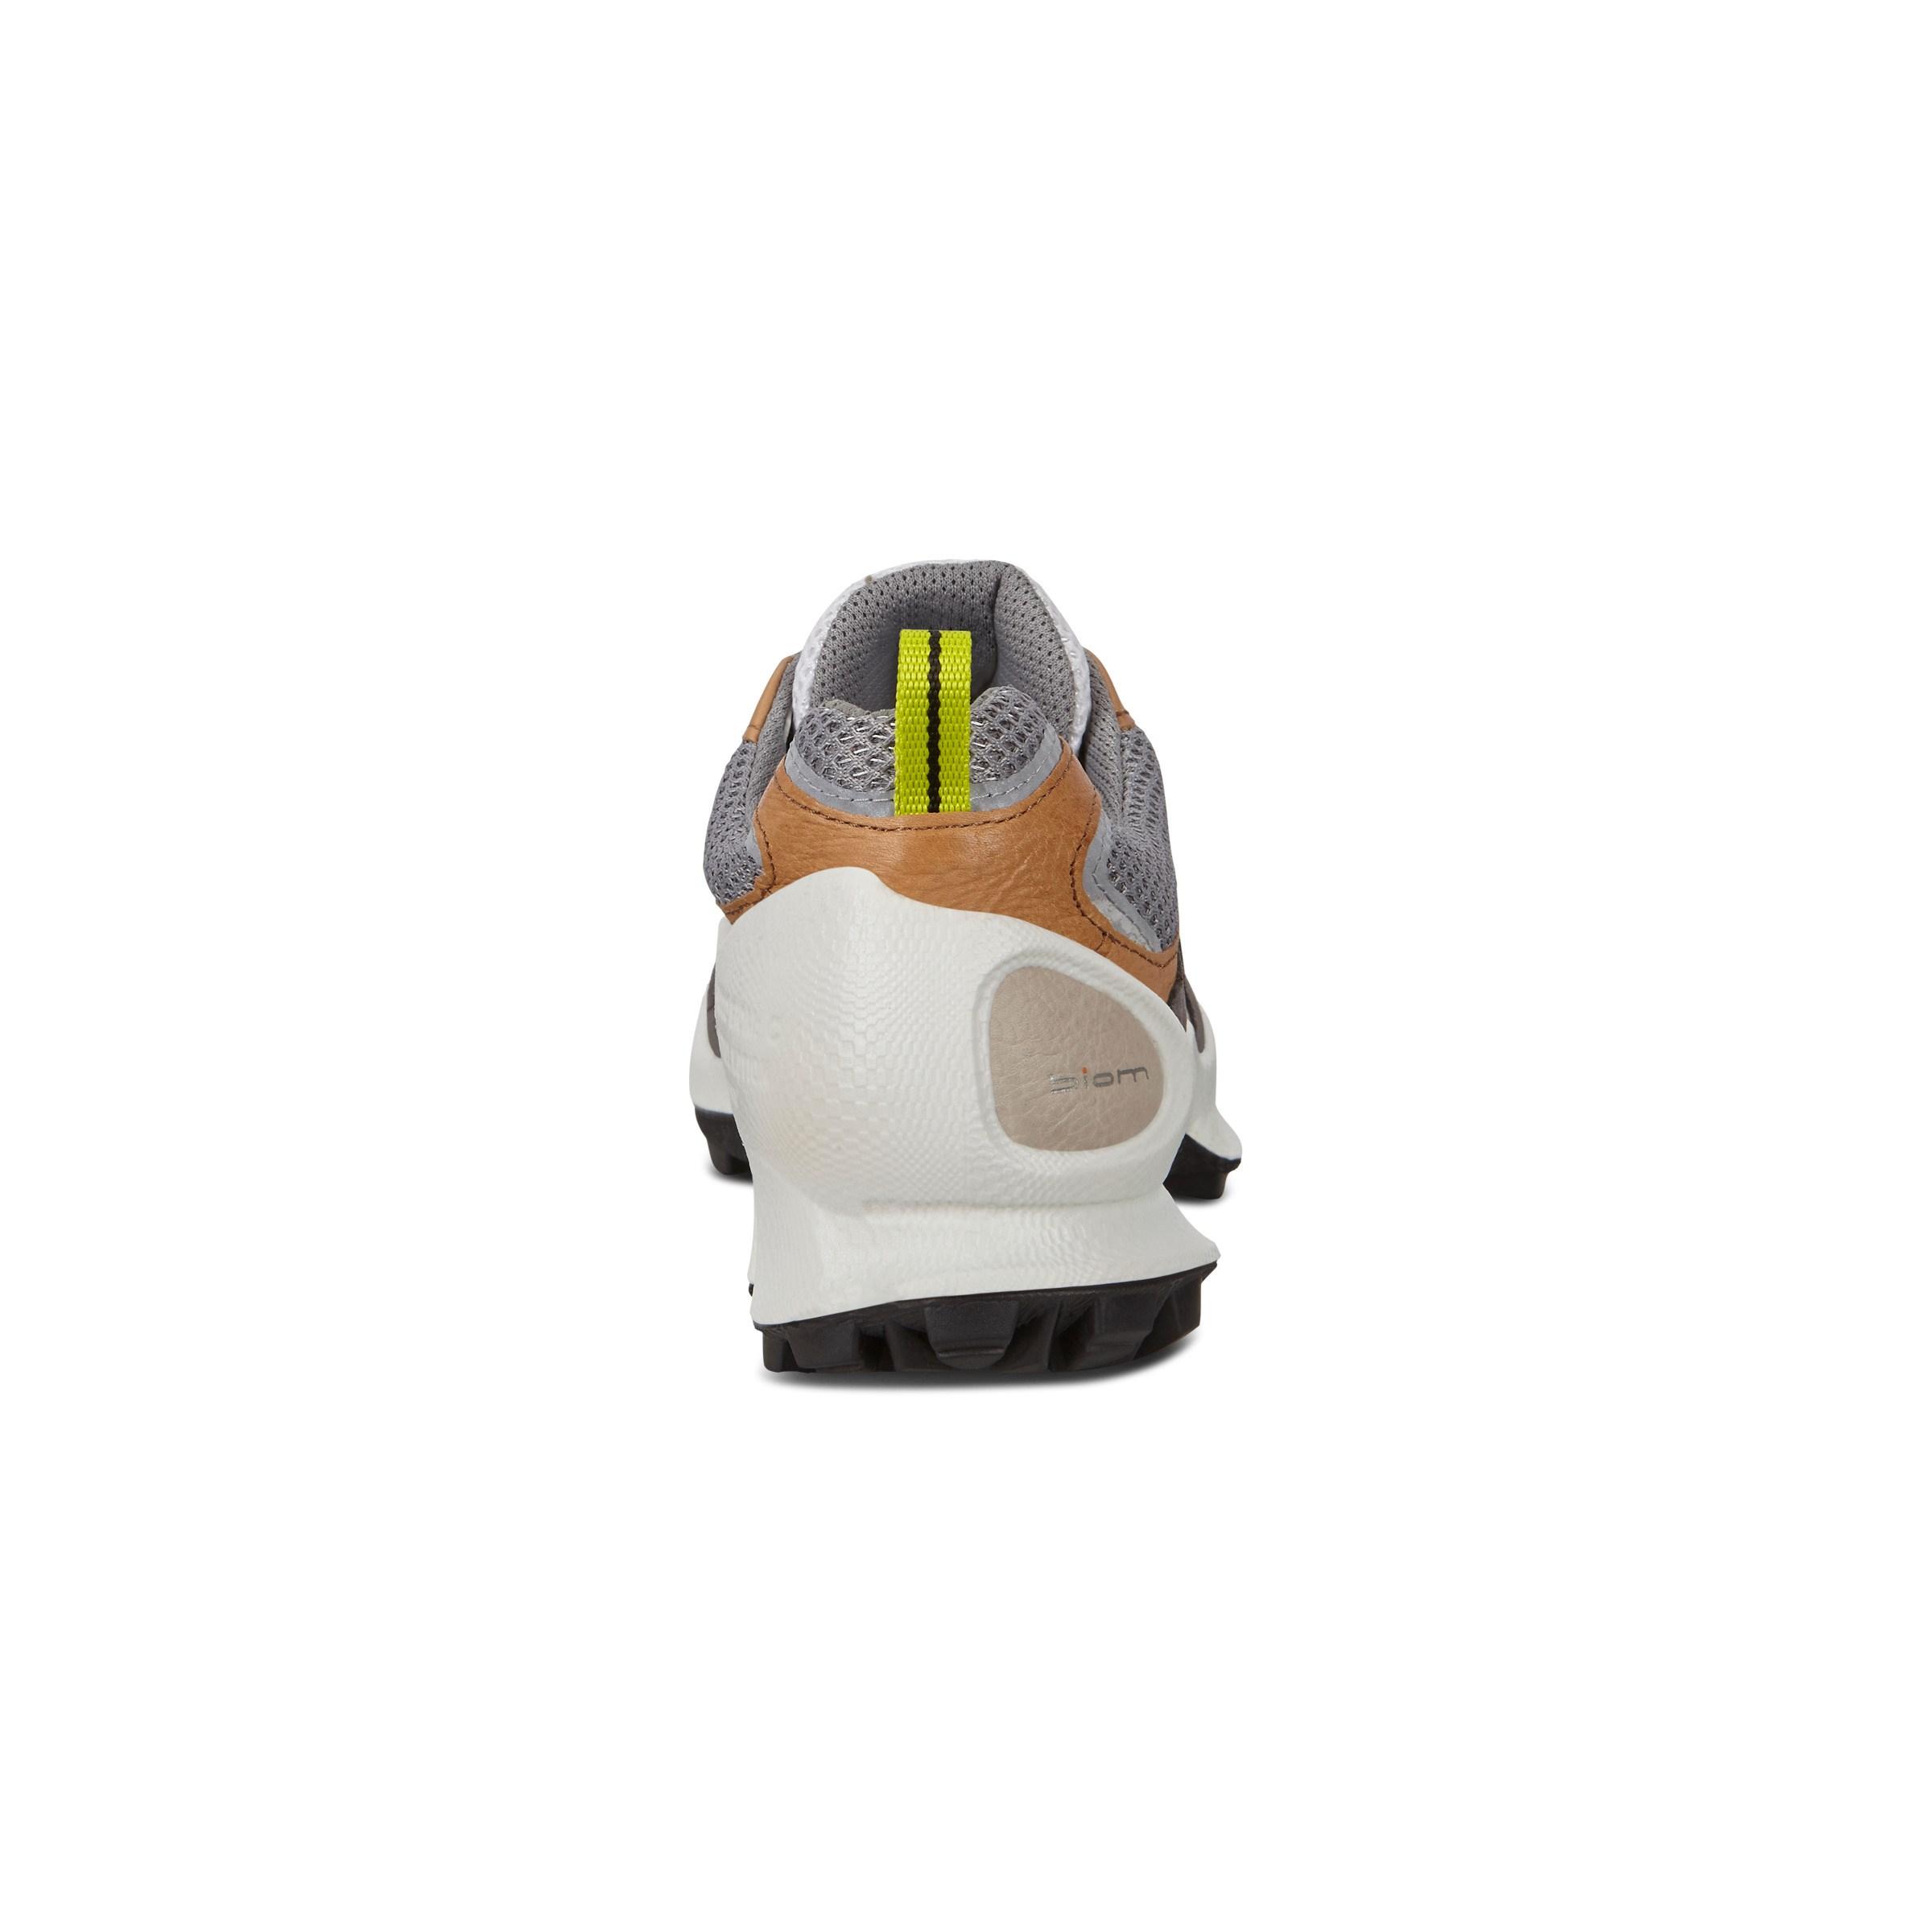 Ecco Sneakers met veters veelkleurig